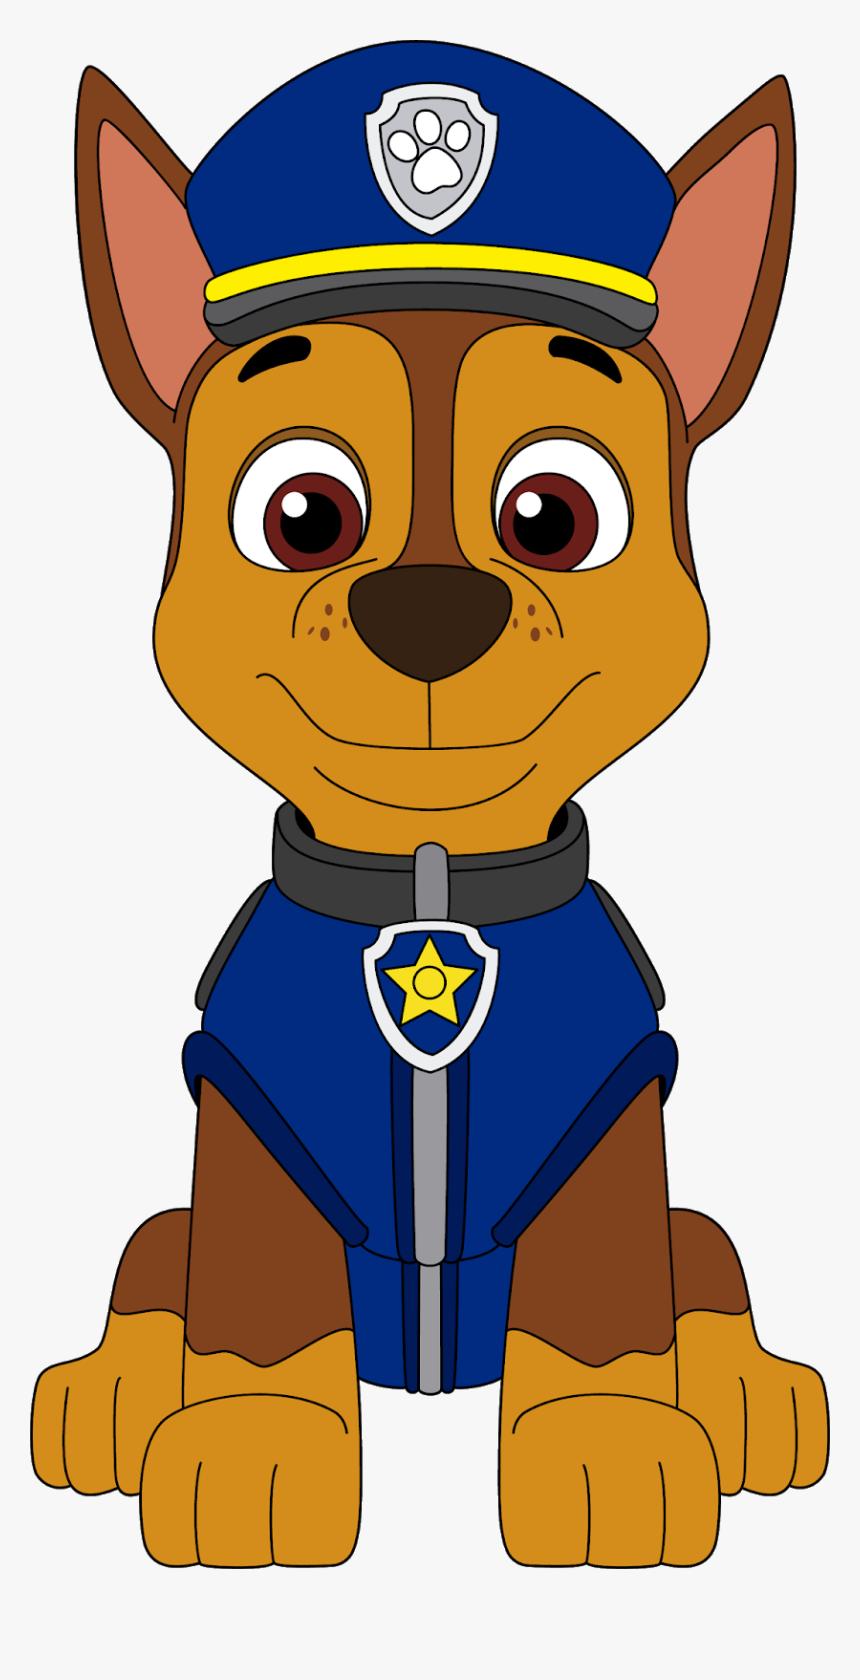 Chase 3 Patrulha Canina Vetor Grátis Paw Patrol.